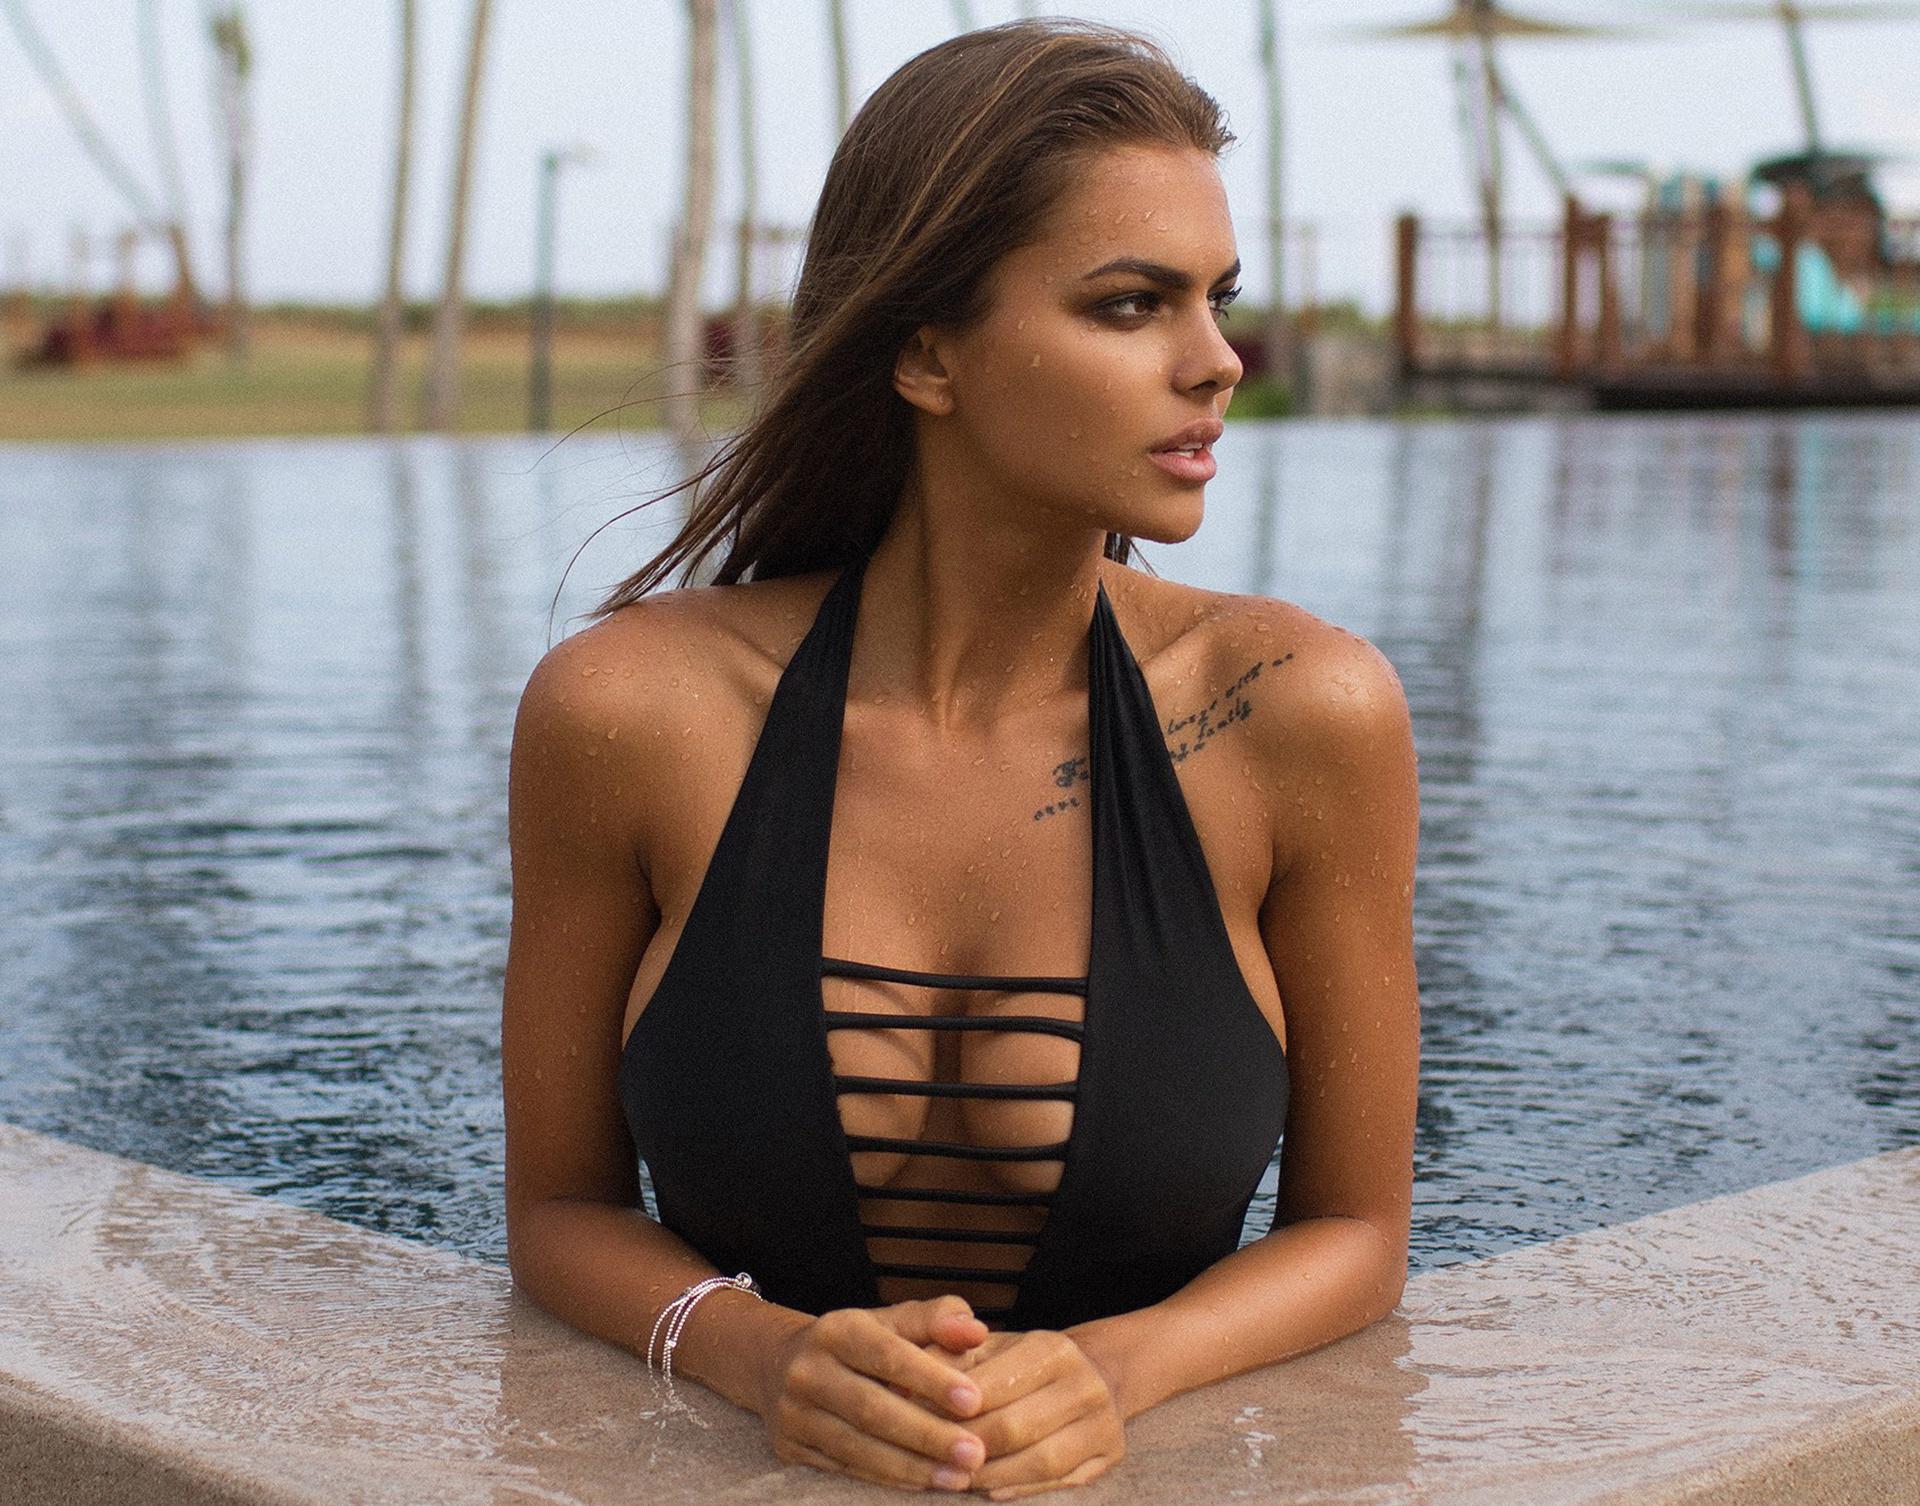 Boobs viki odintcova Viktoria Odintsova